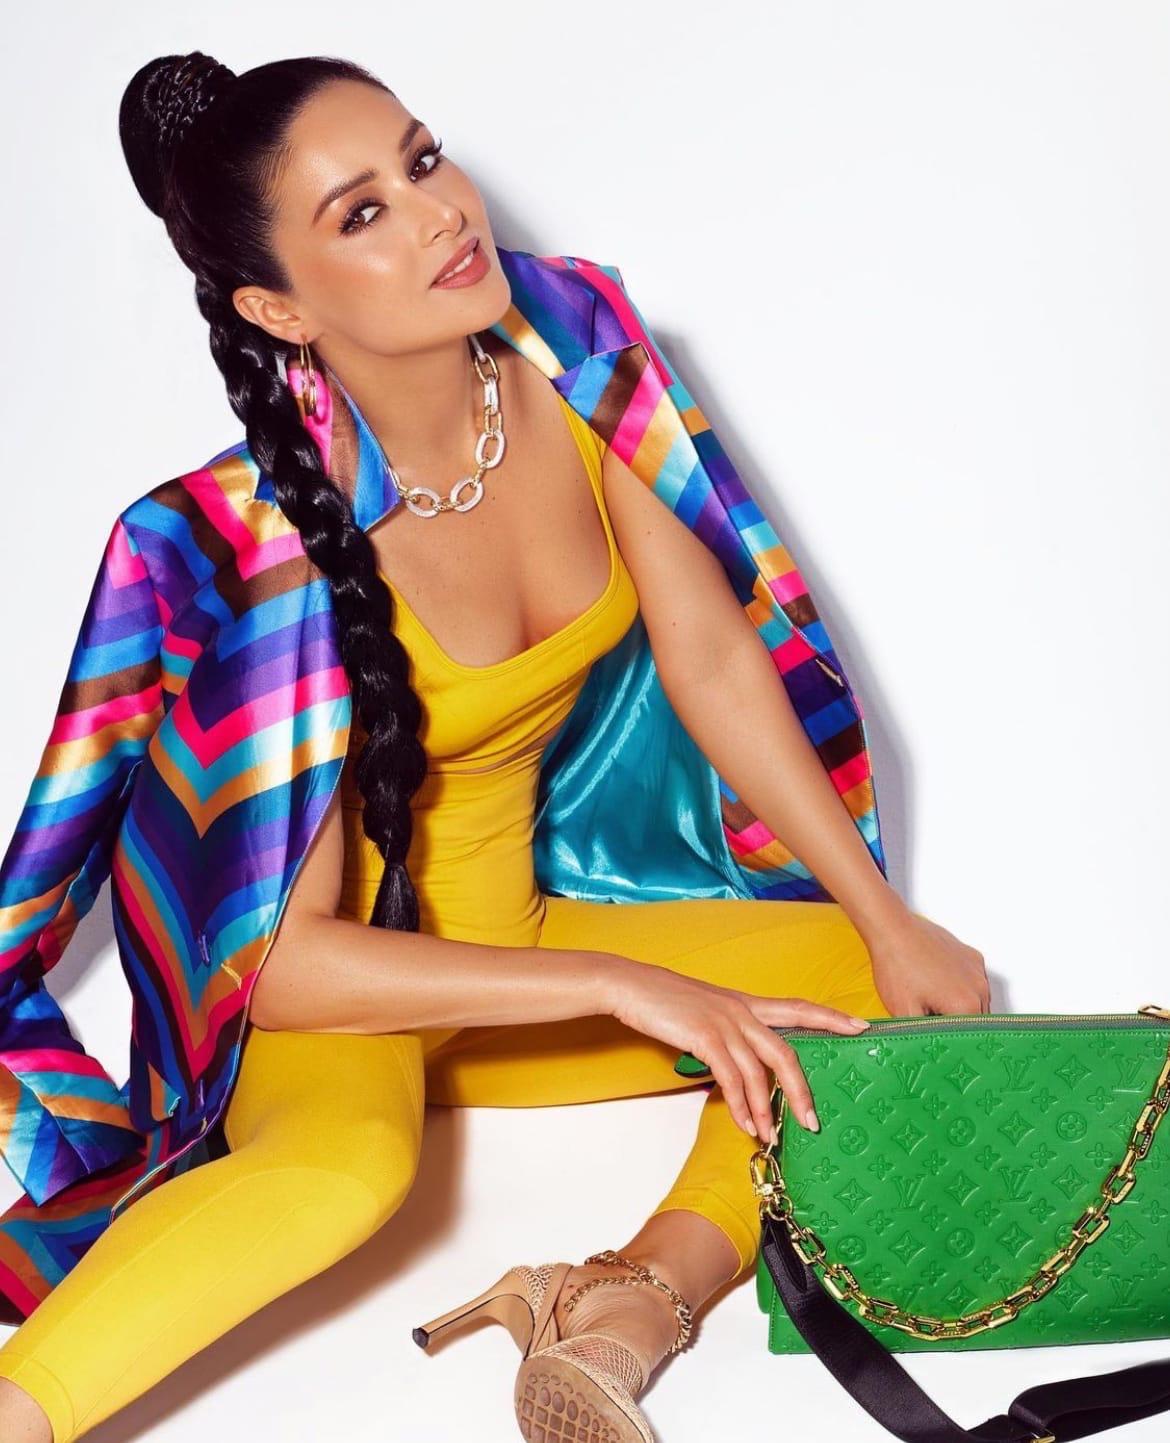 Bachelor Bachelorette Franchise - Fashion - All Countries - Discussion  B36LSq5jCok